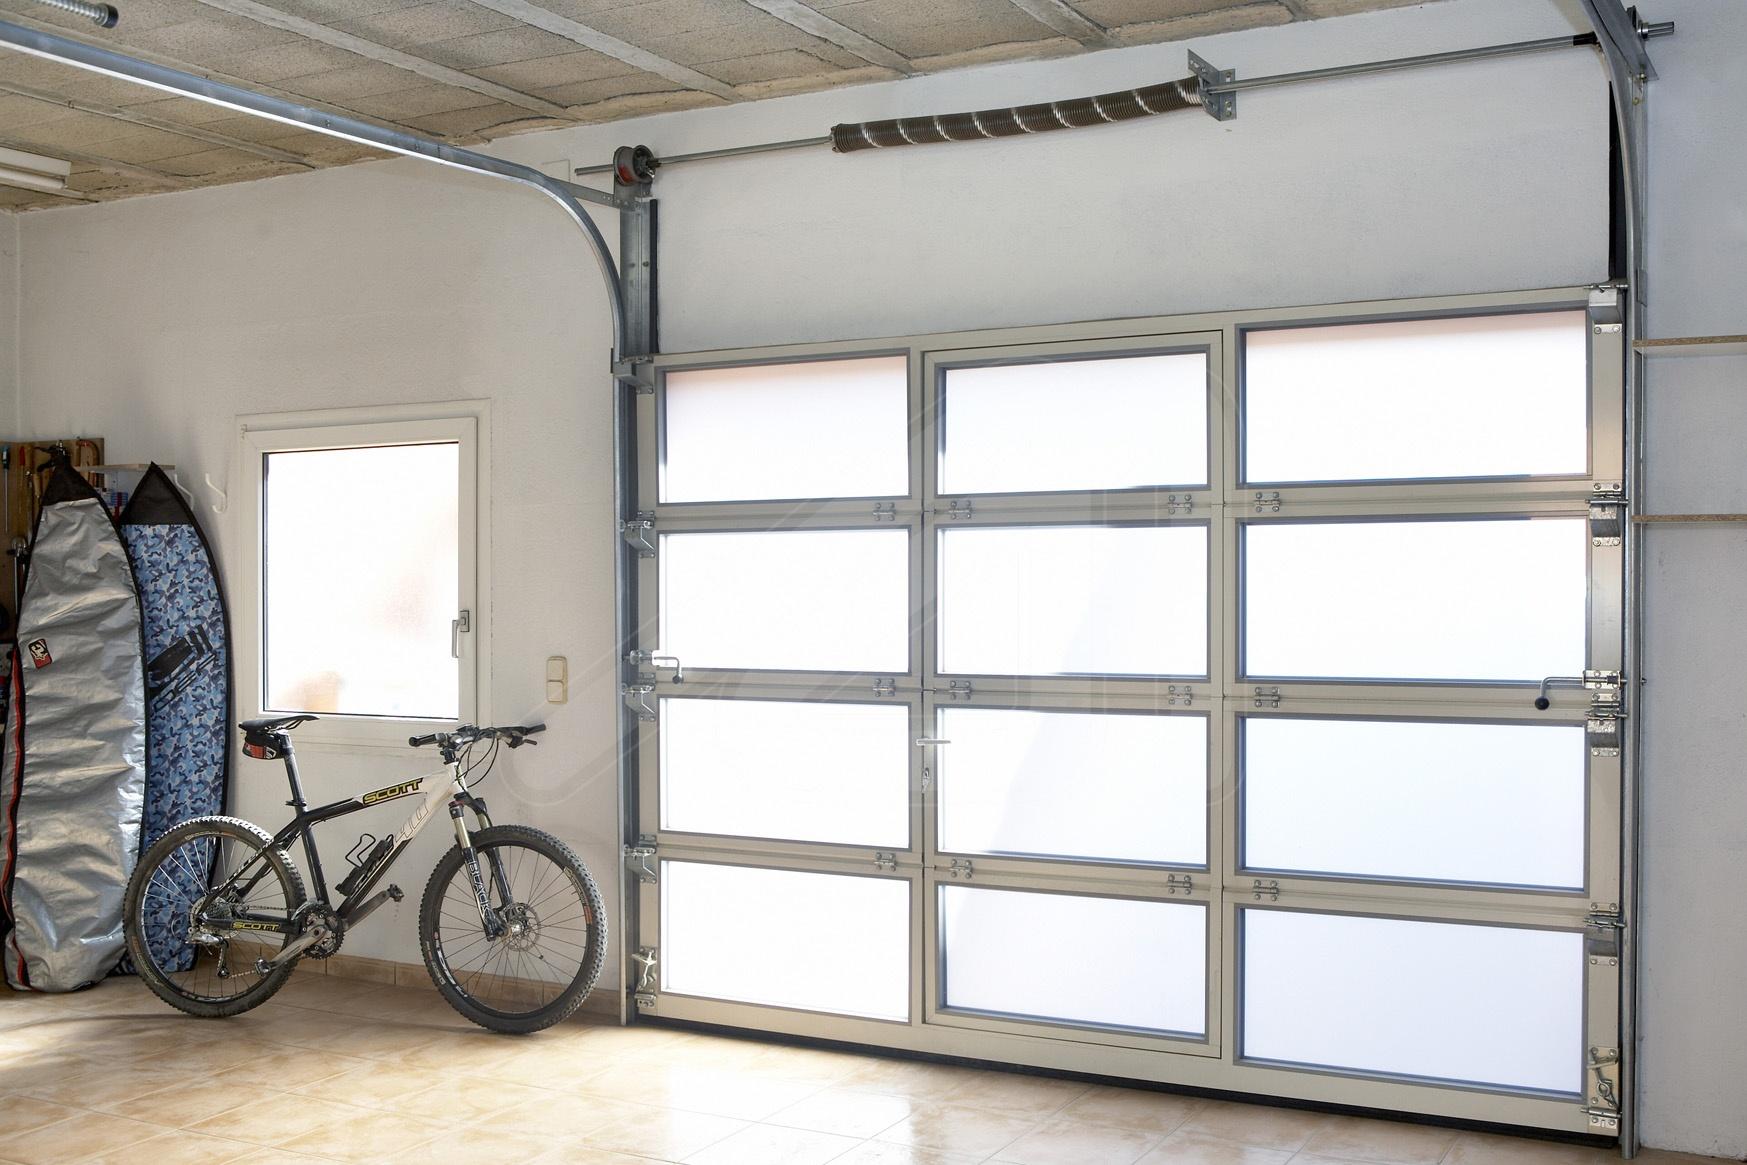 Puerta seccional de garaje acero chapa corten angel mir ngel mir - Puertas de garaje murcia ...